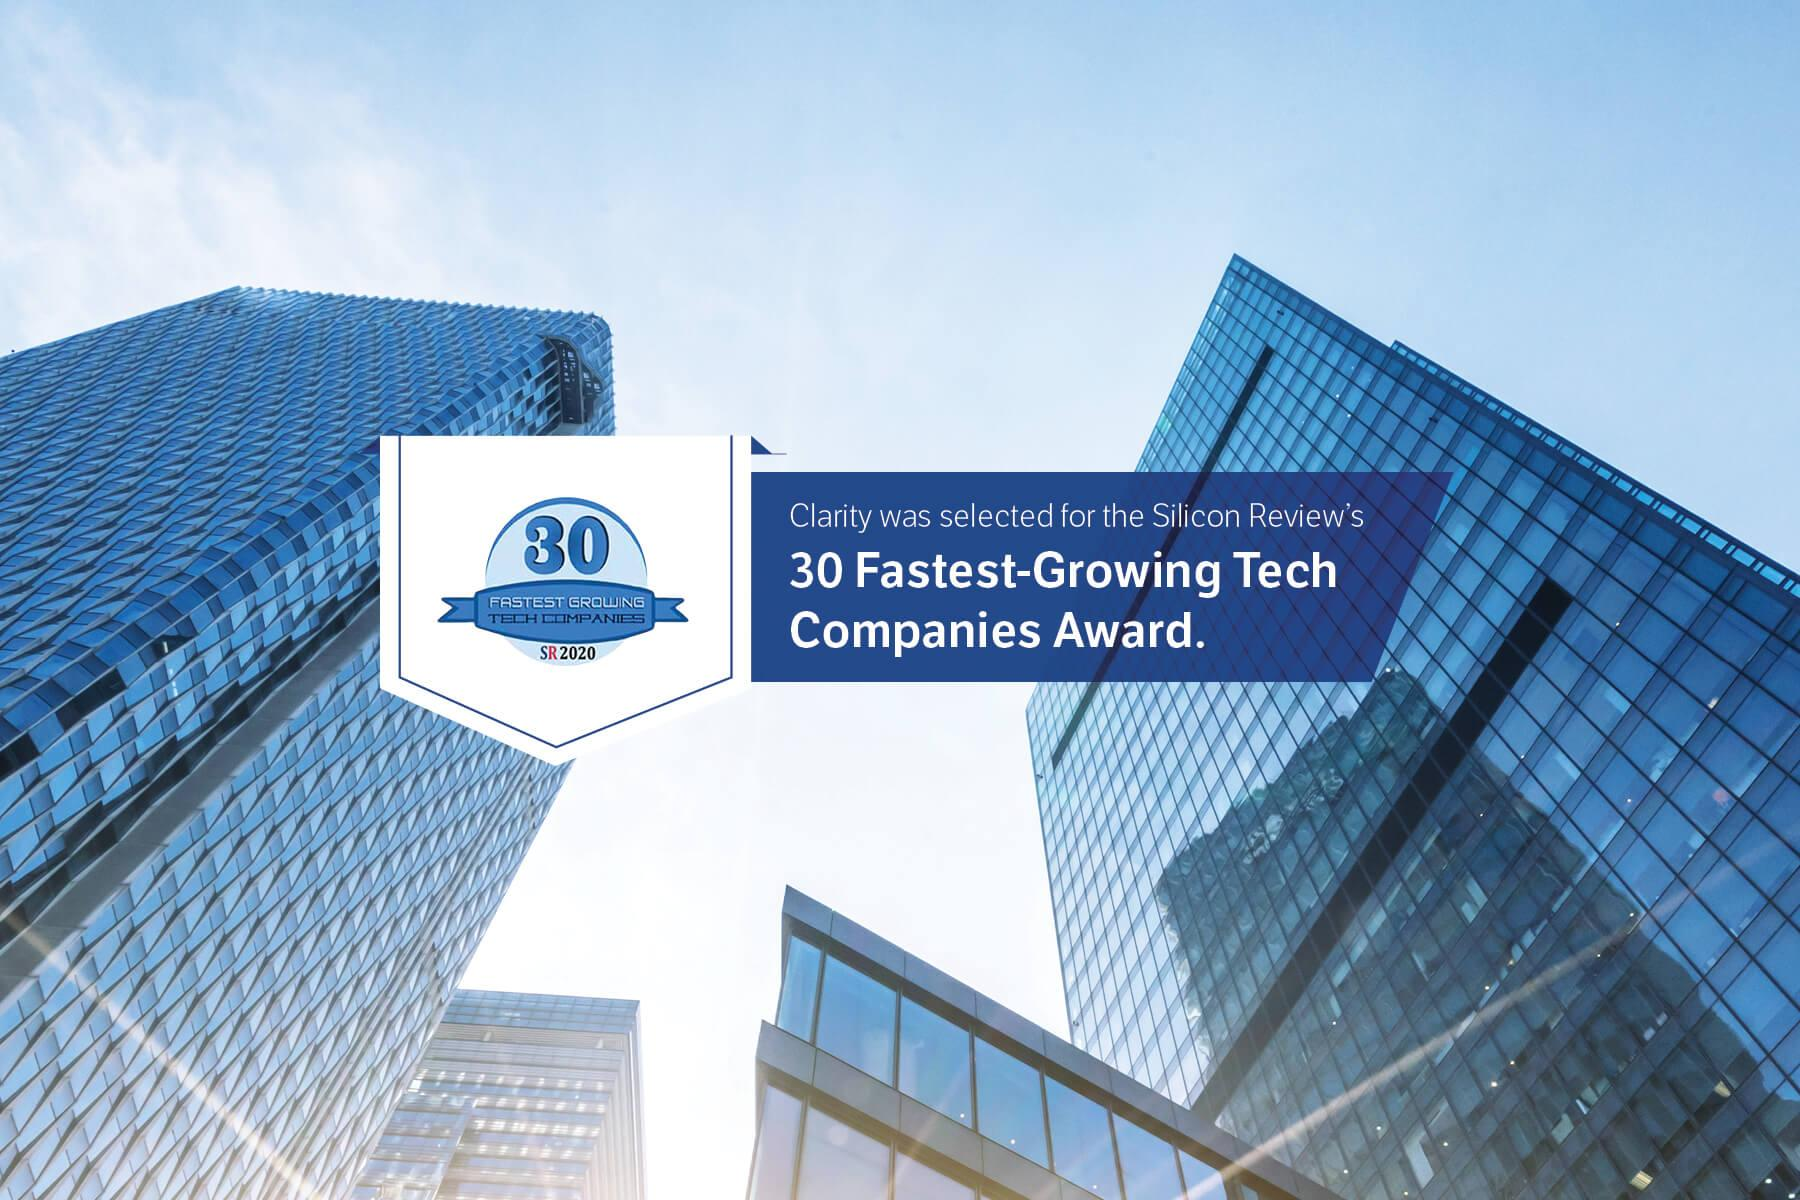 30 Fastest Growing Companies Award